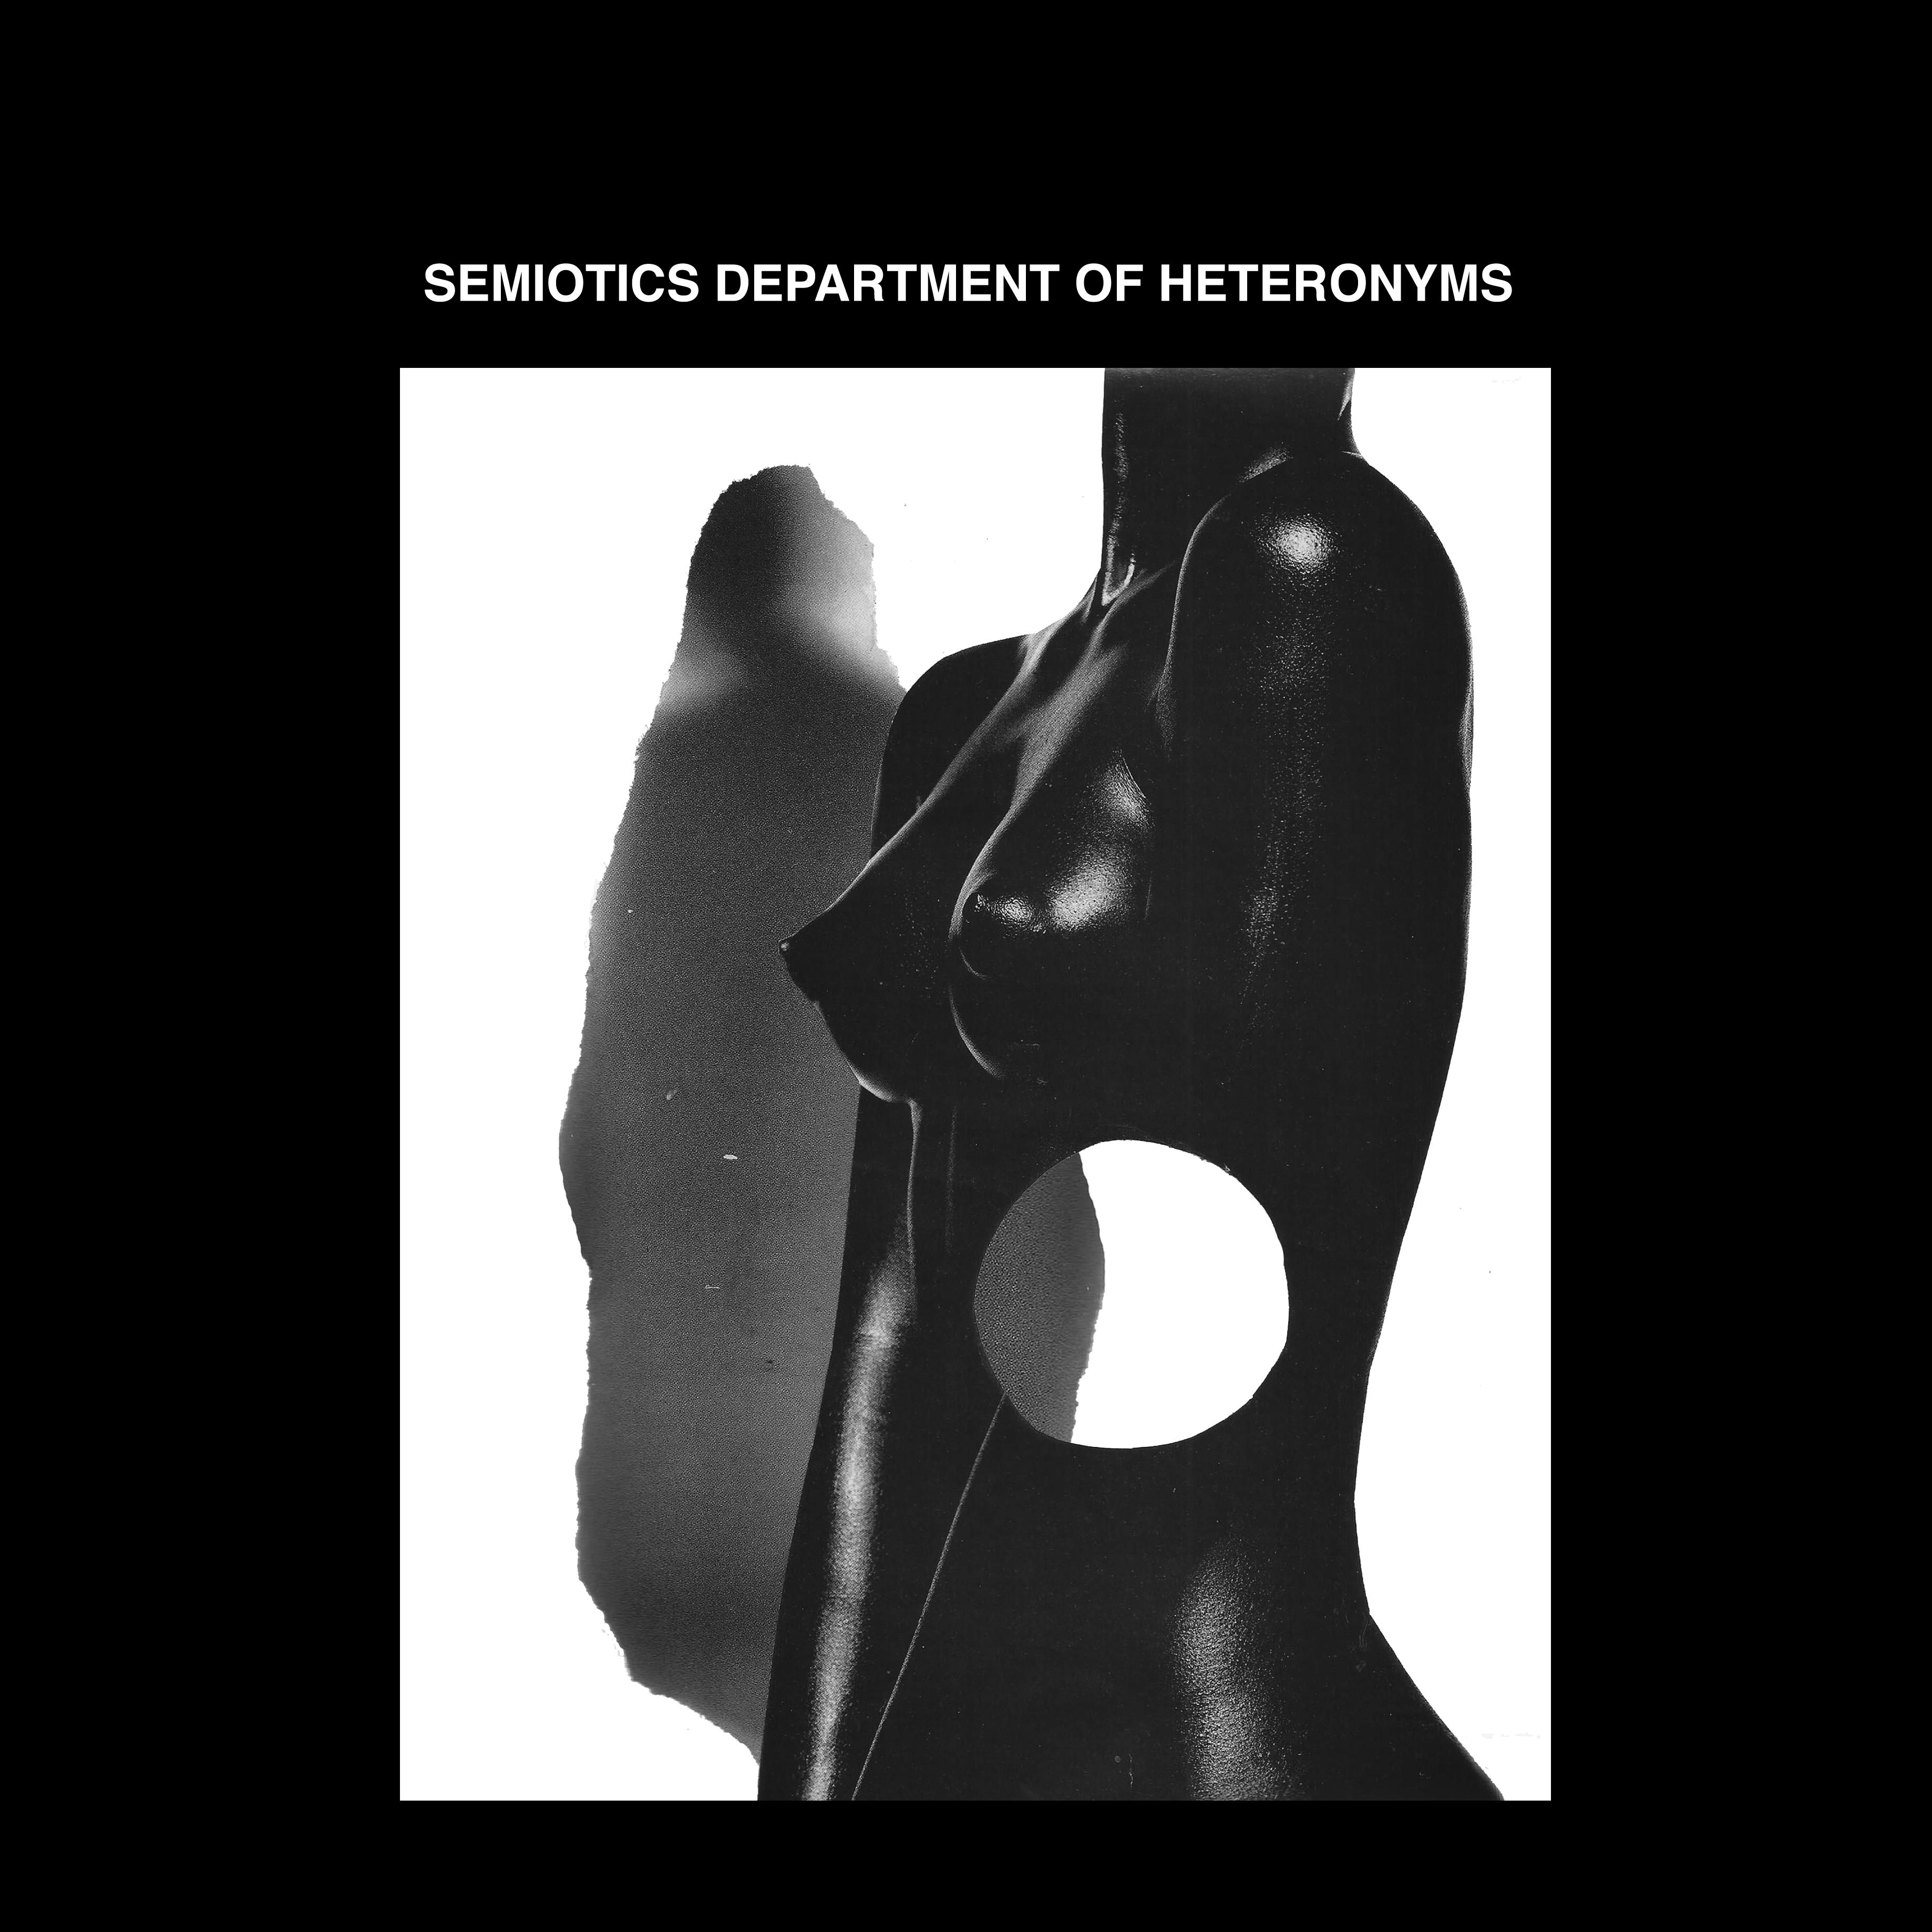 Semiotics Department of Heteronyms, self-titled